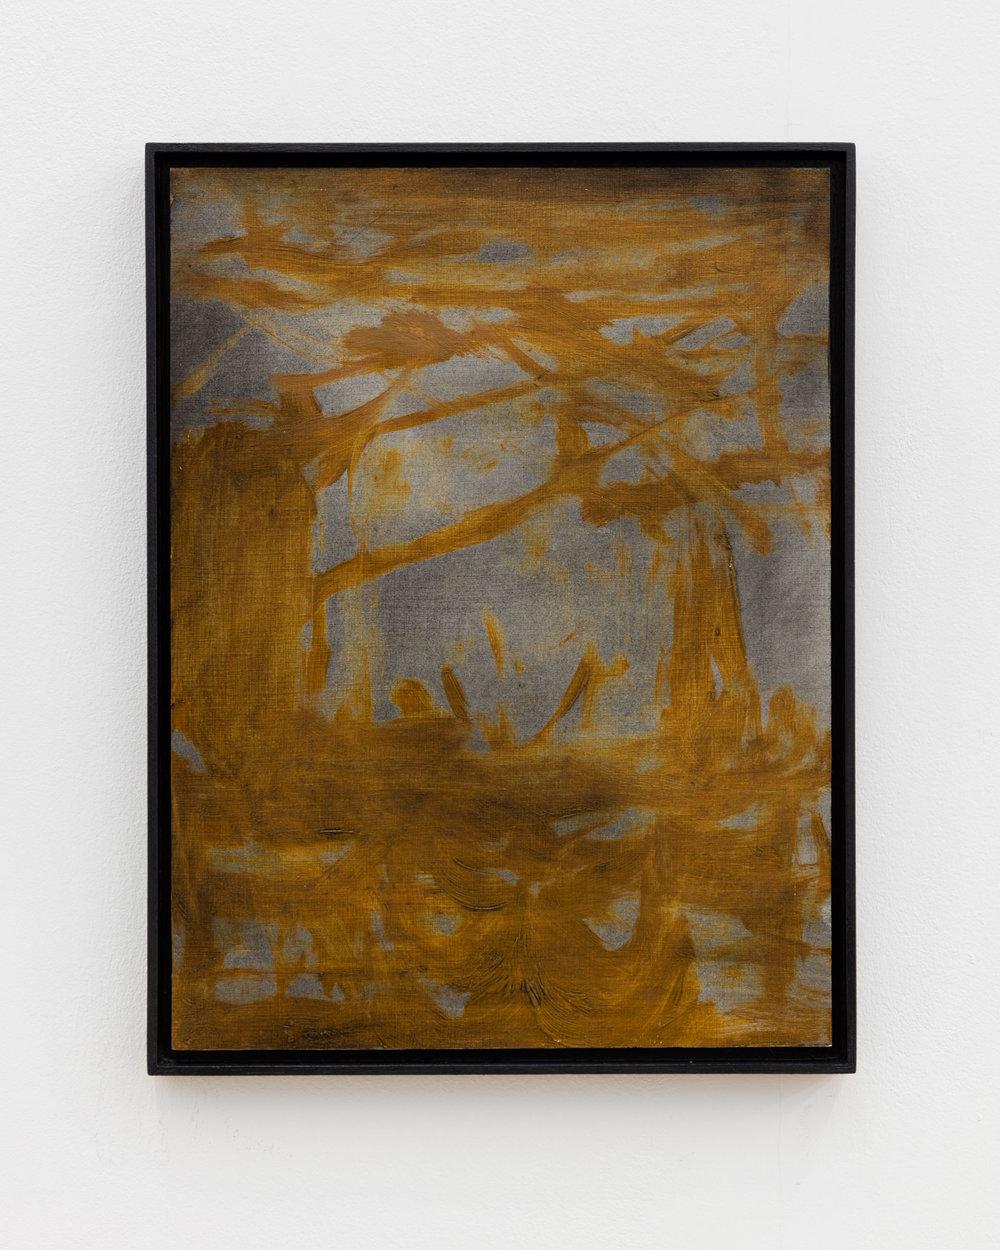 Veronika Hilger: Untitled, 2018, oil on paper on MDF in artists frame, 39,8 x 29,7 cm